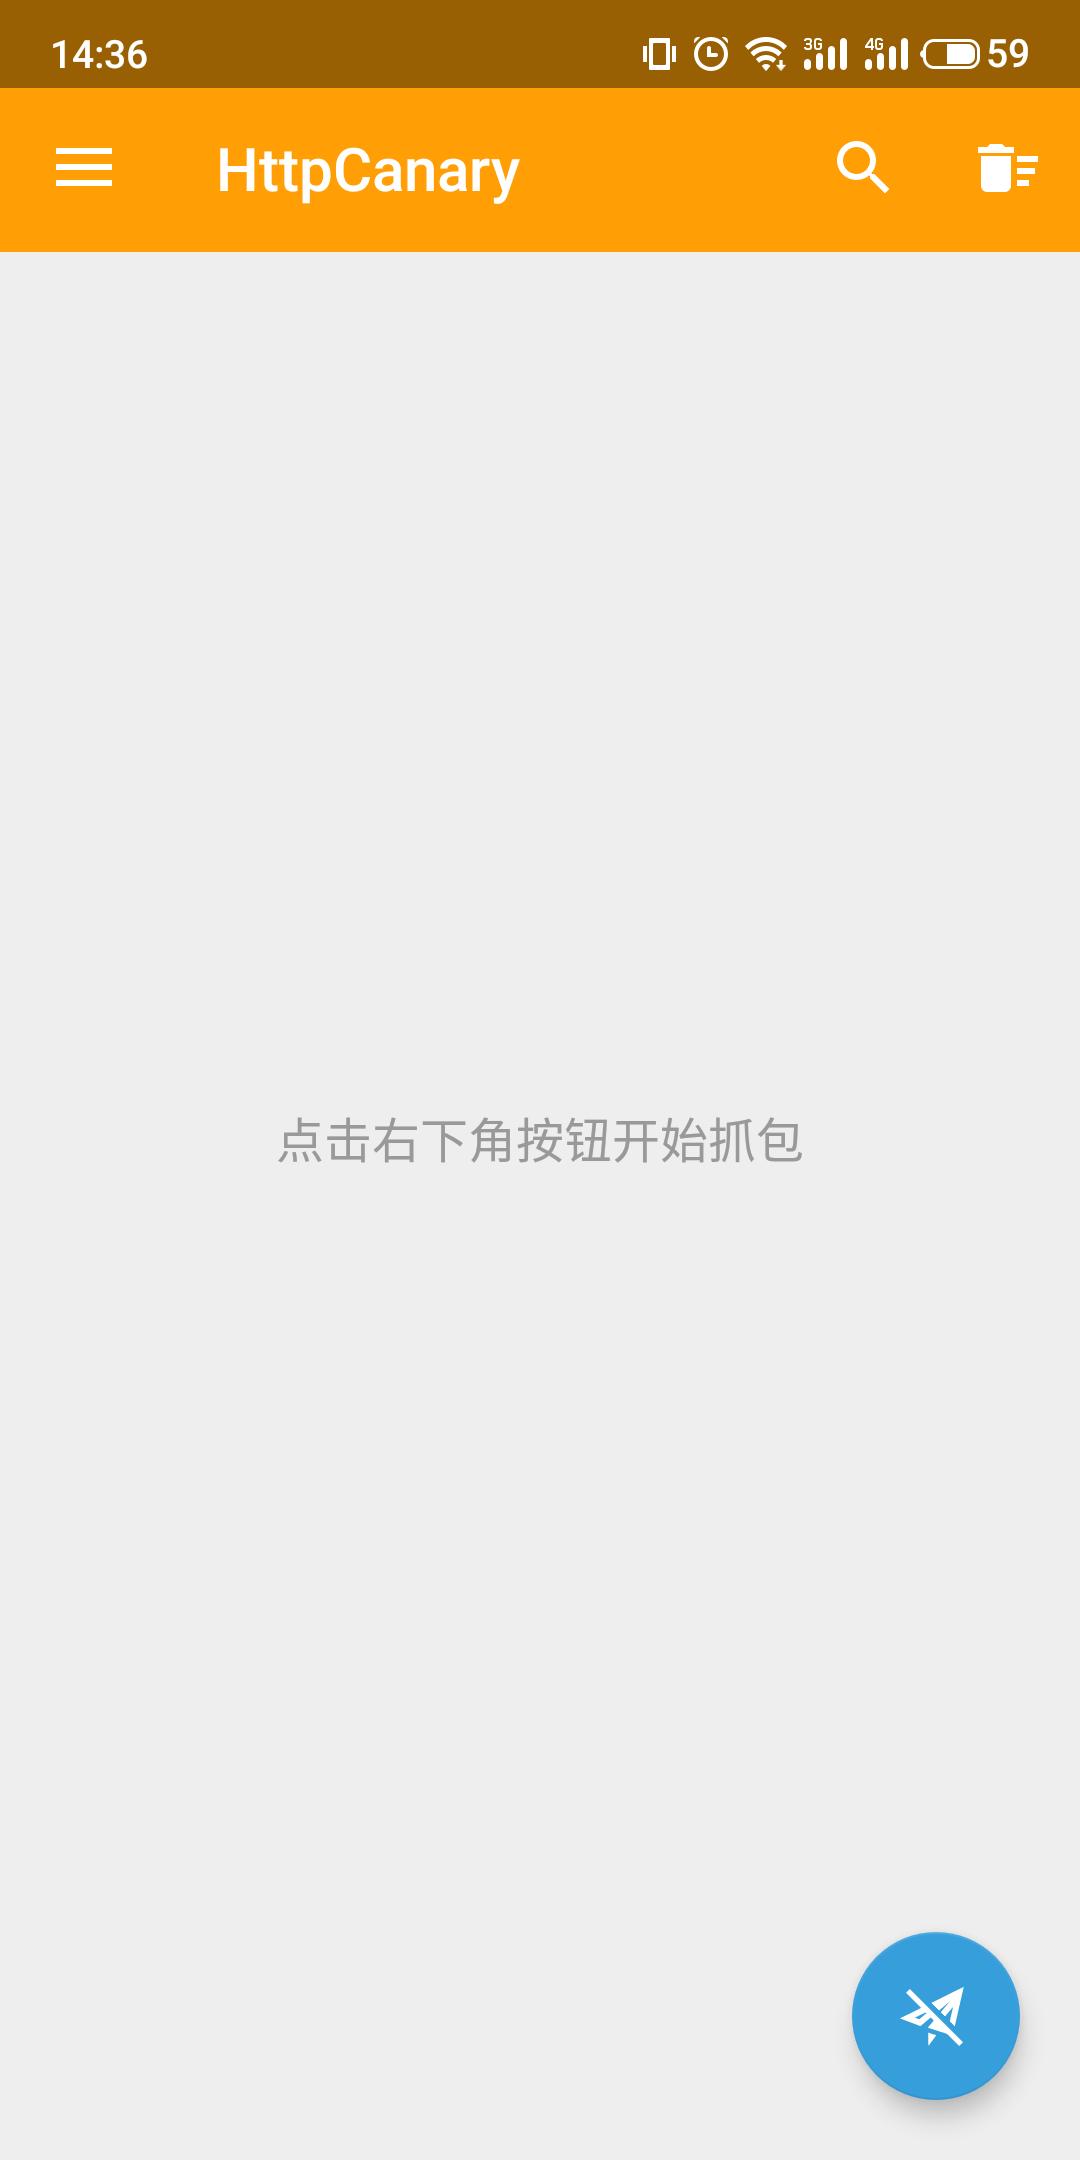 httpcanary_index